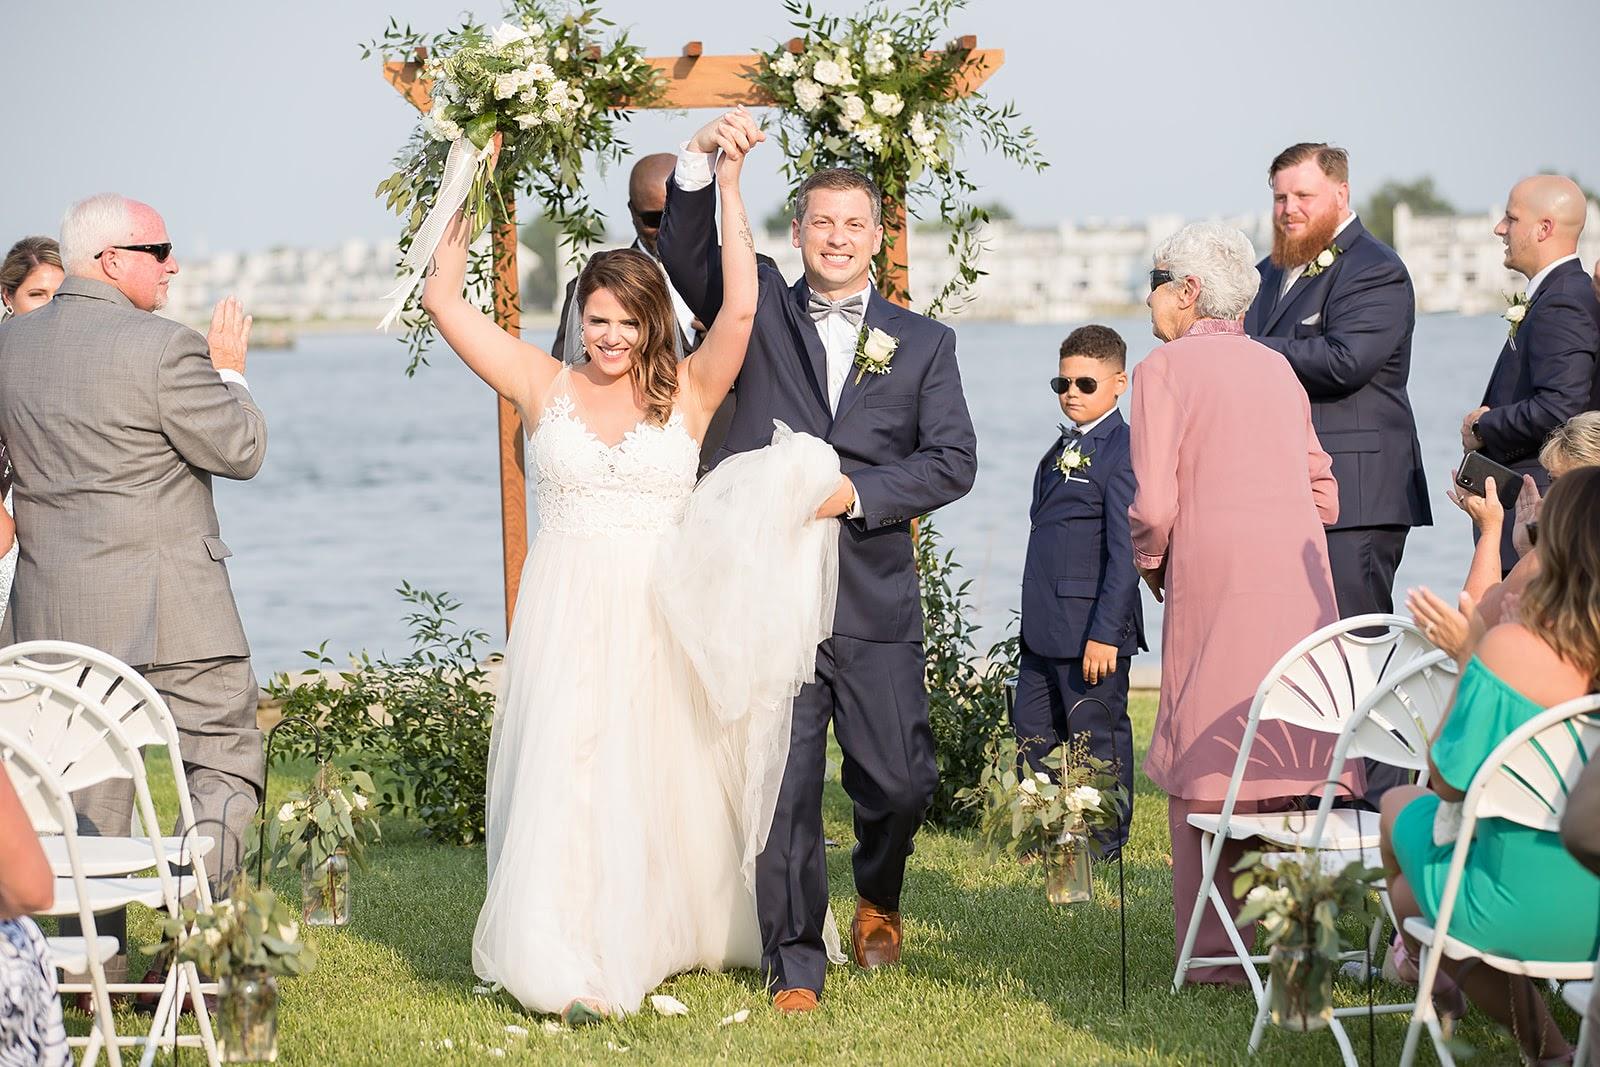 Jenna & Jasons' Wedding Recap: An Unforgettable Celebration by the Water